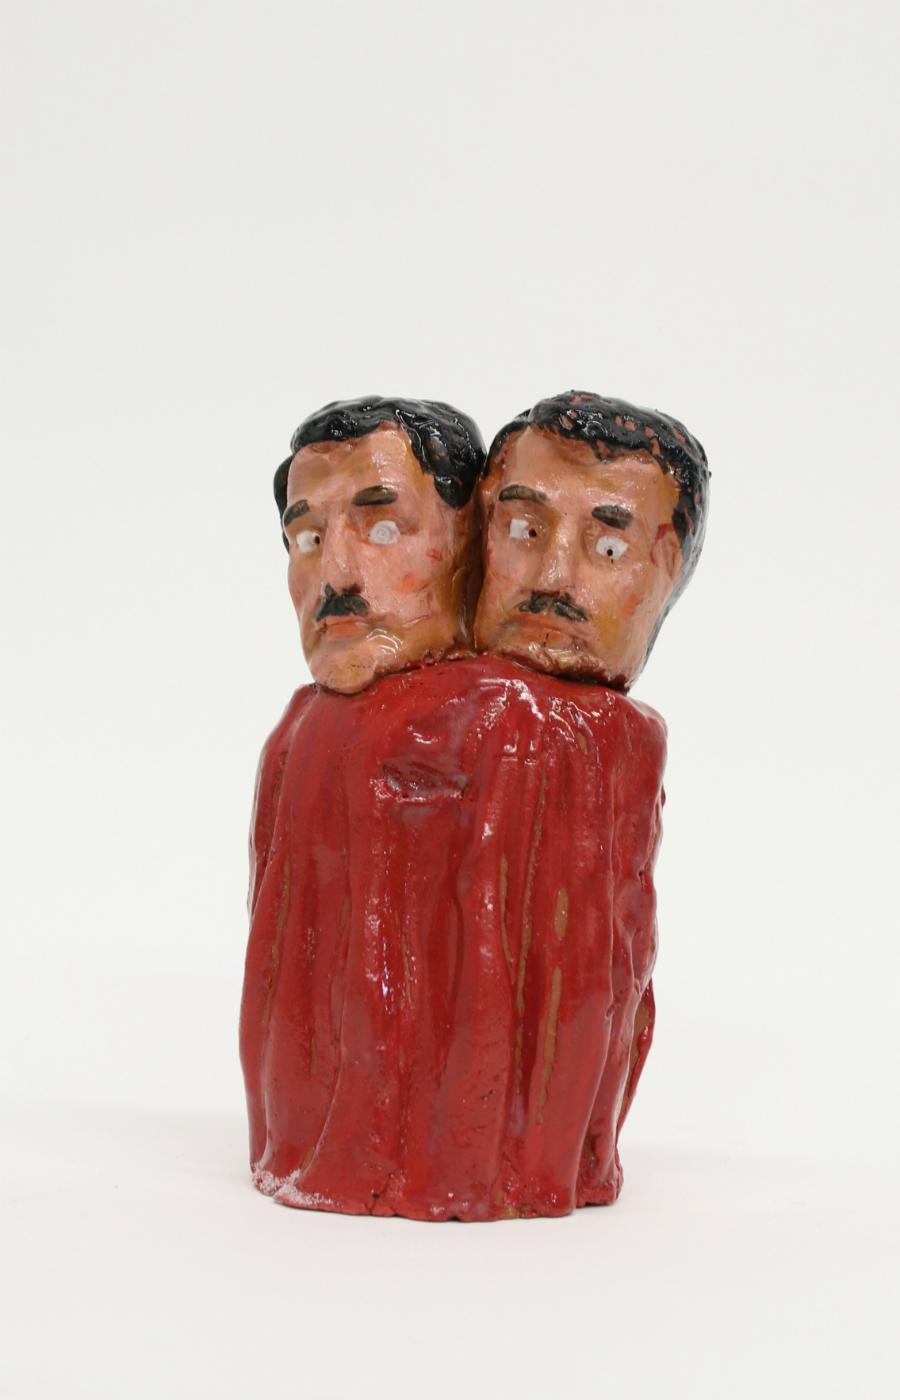 Christian-Vargas_Siamese-Twin-Saint-Red.jpg